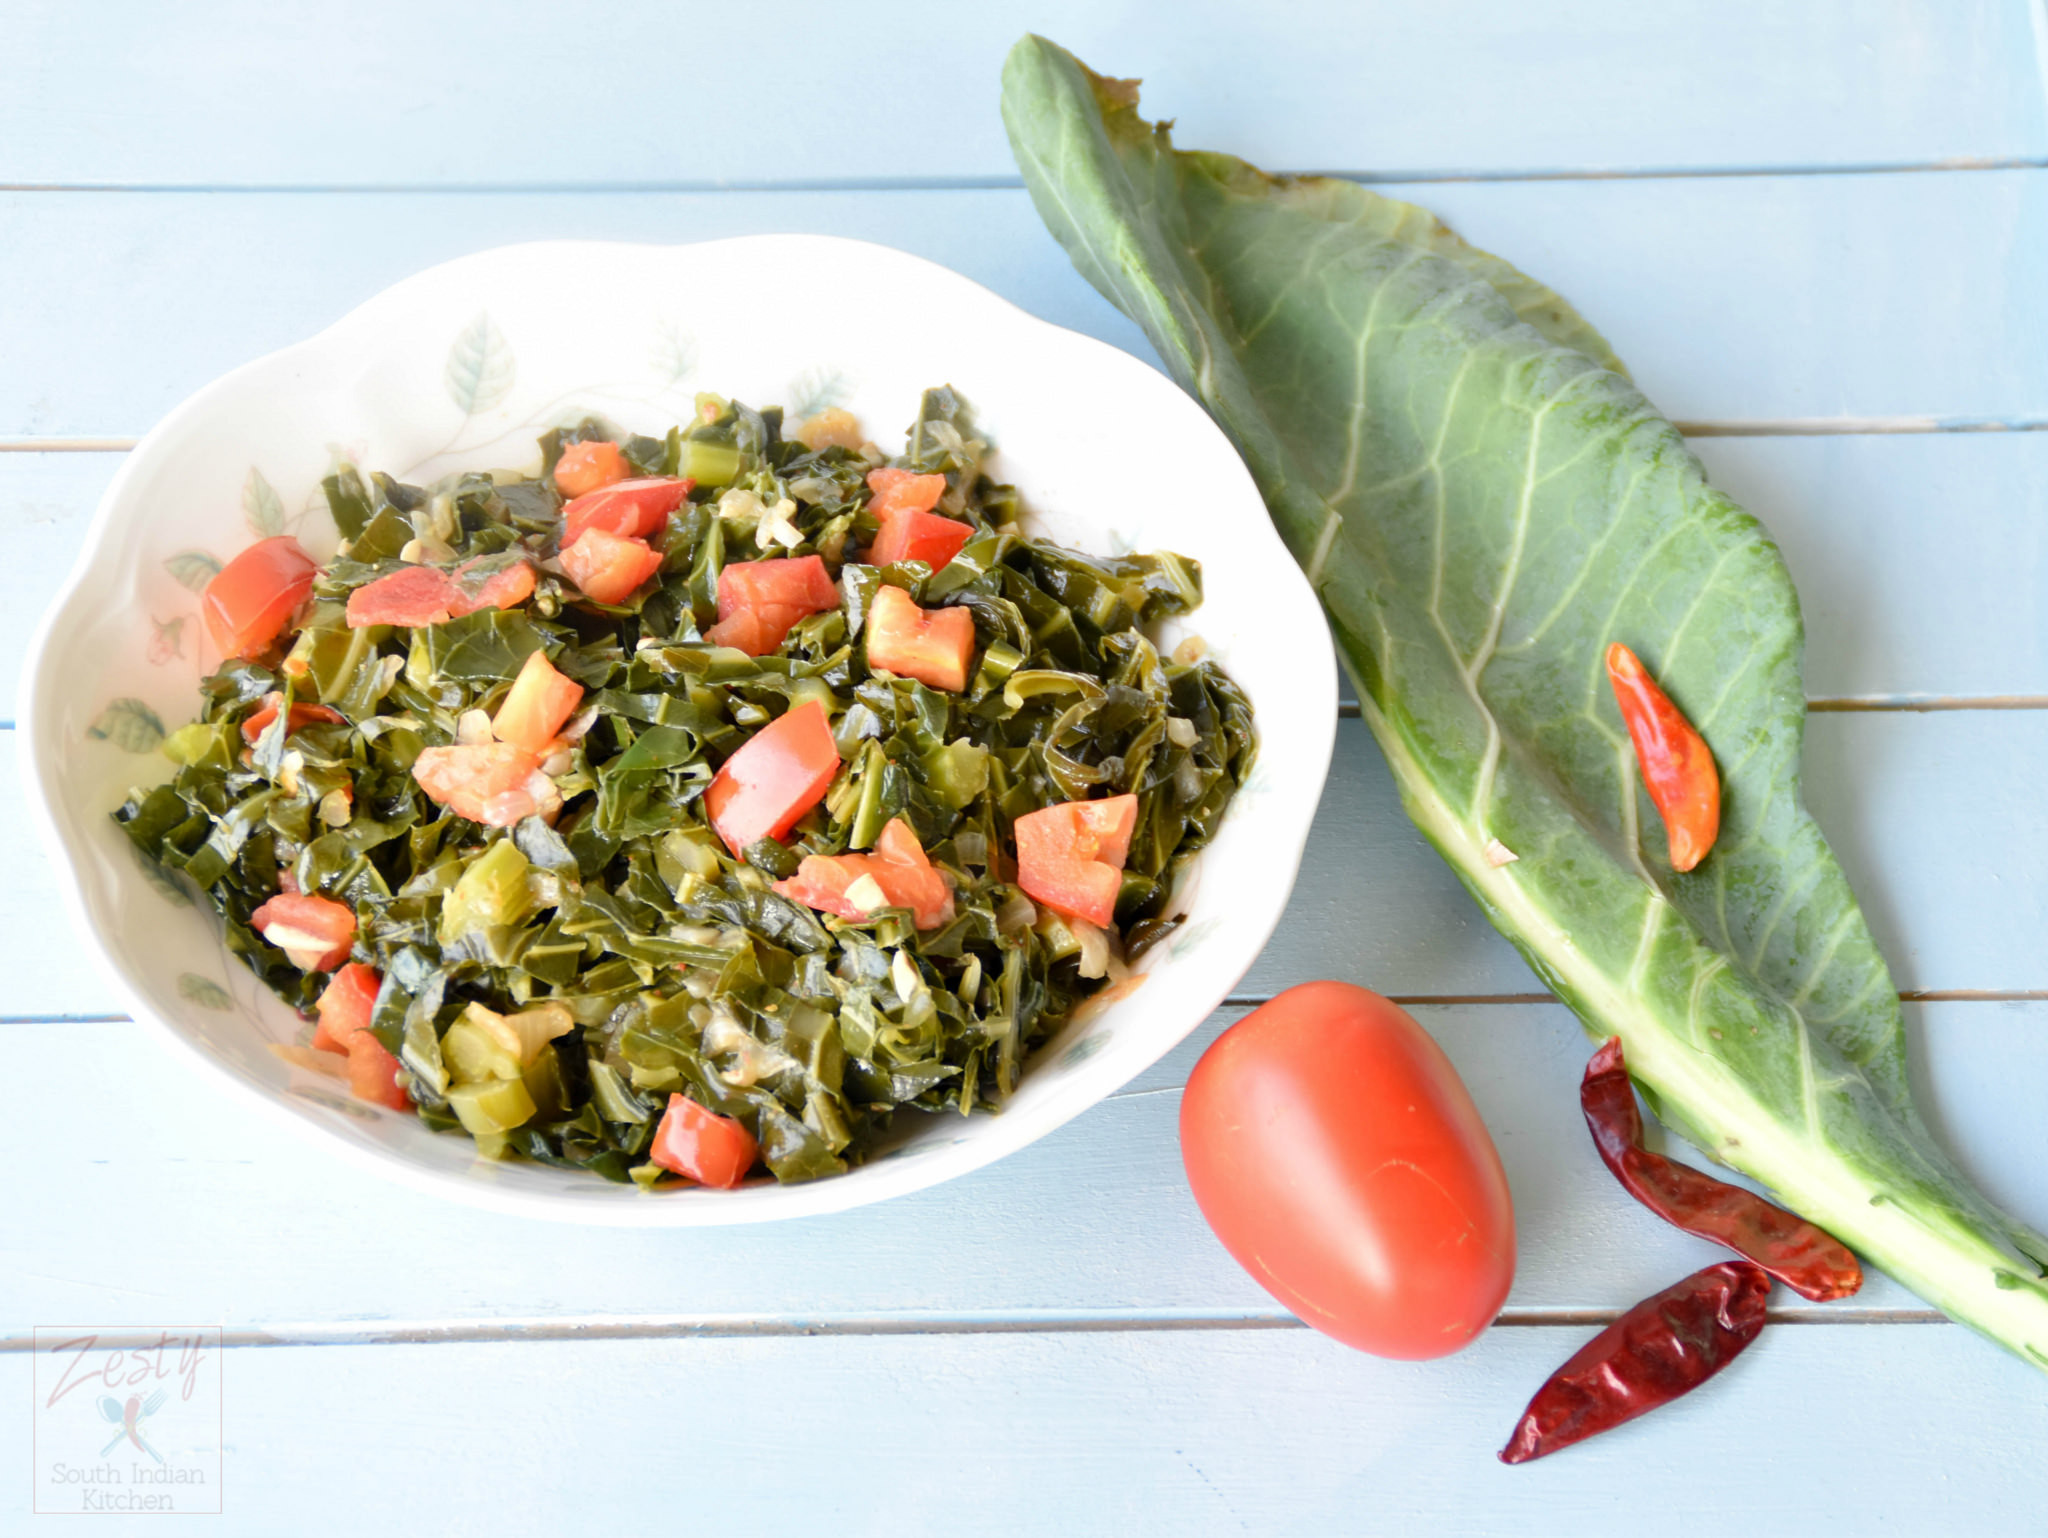 Collard Greens Vegetarian Recipes  Southern Style Ve arian Collard Greens Zesty South